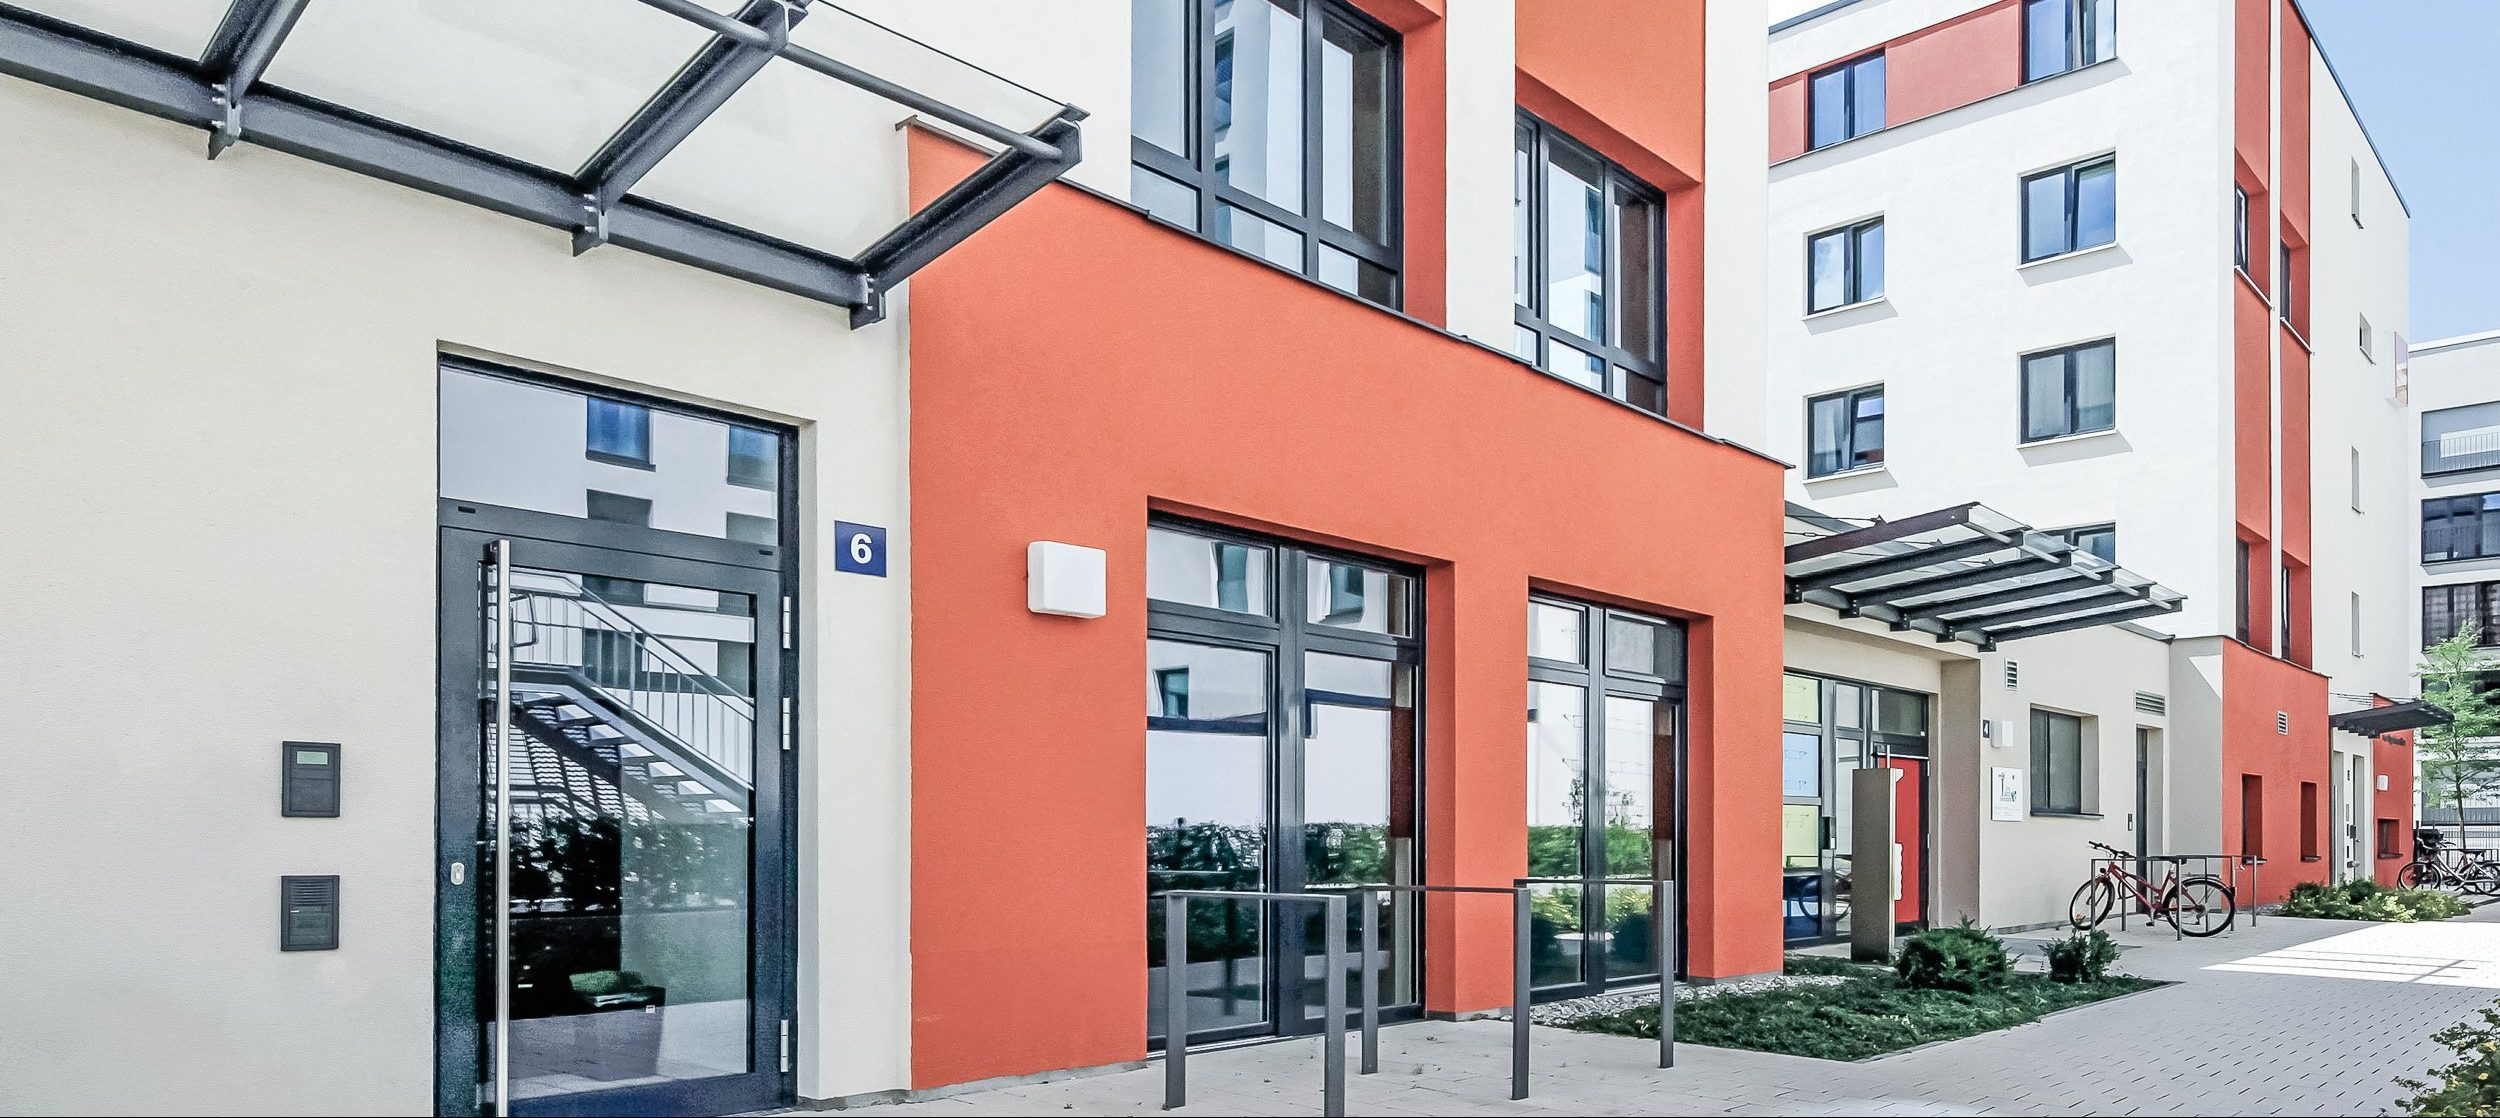 SMARTments Frankfurt - Wohnraum